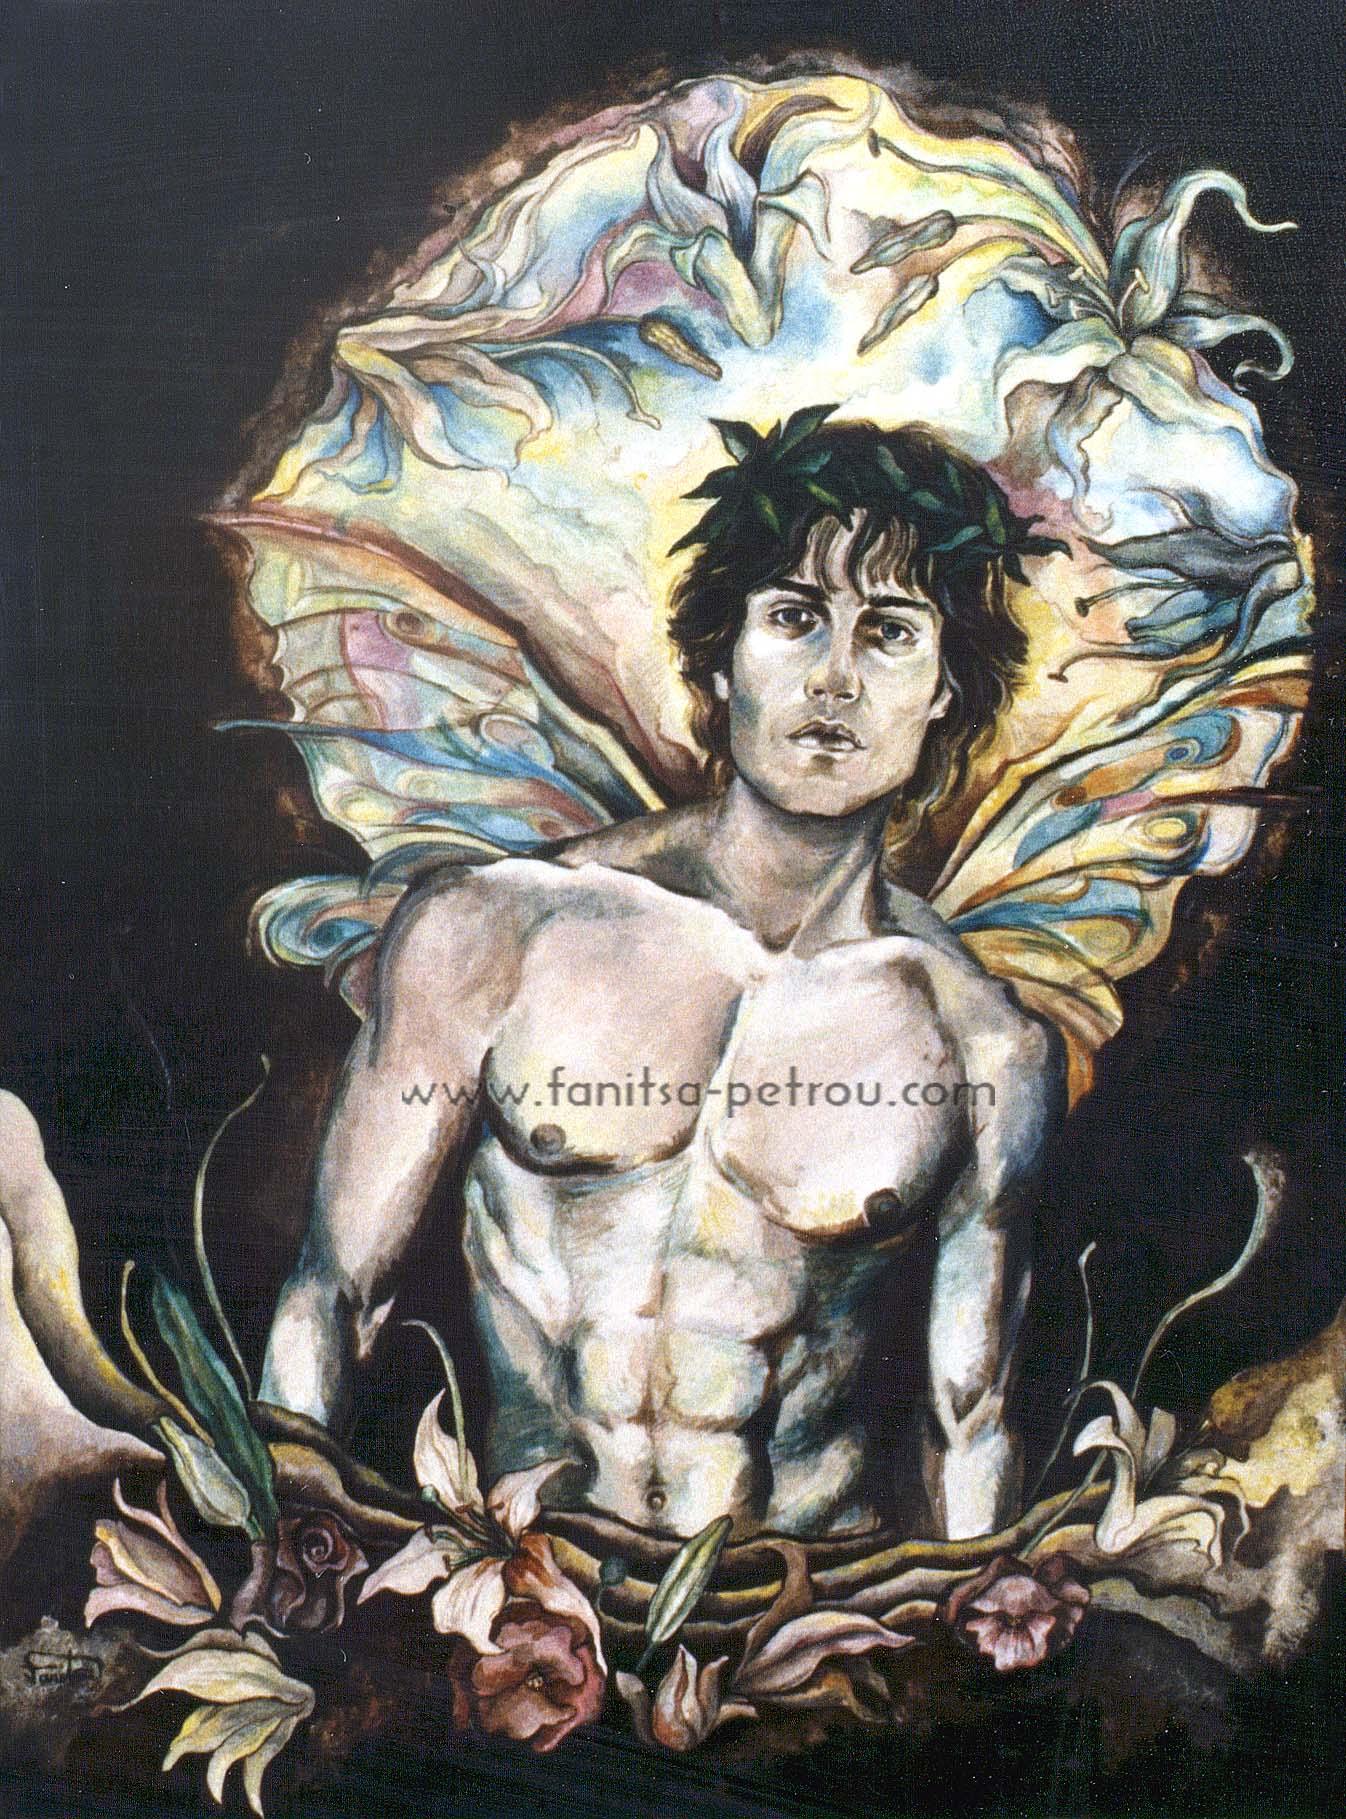 adonis - Elipse cover